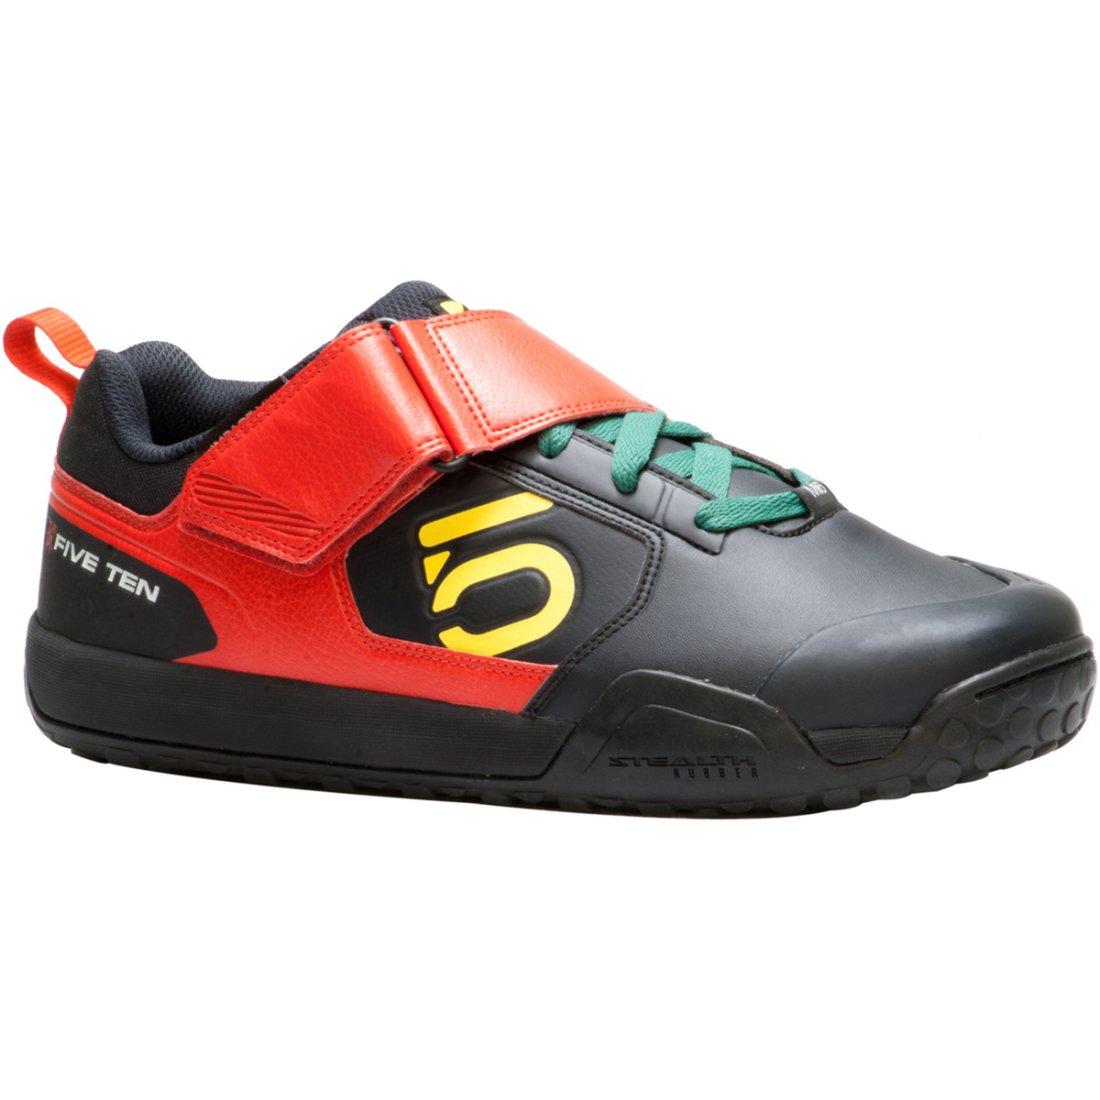 productos de calidad buscar autorización pero no vulgar Zapatillas FIVE TEN Impact VXi Clipless Rasta